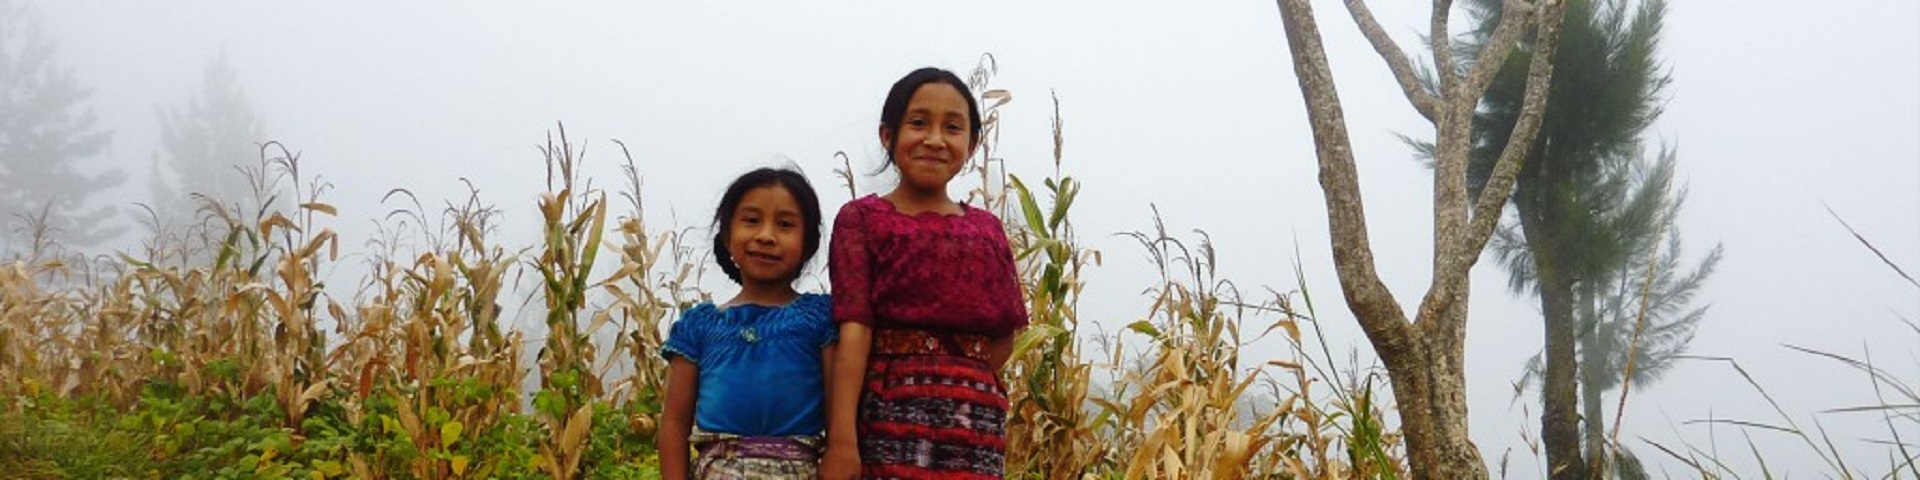 Guatemala_jeunes_filles_Credit_photo_NicoleDeschamps